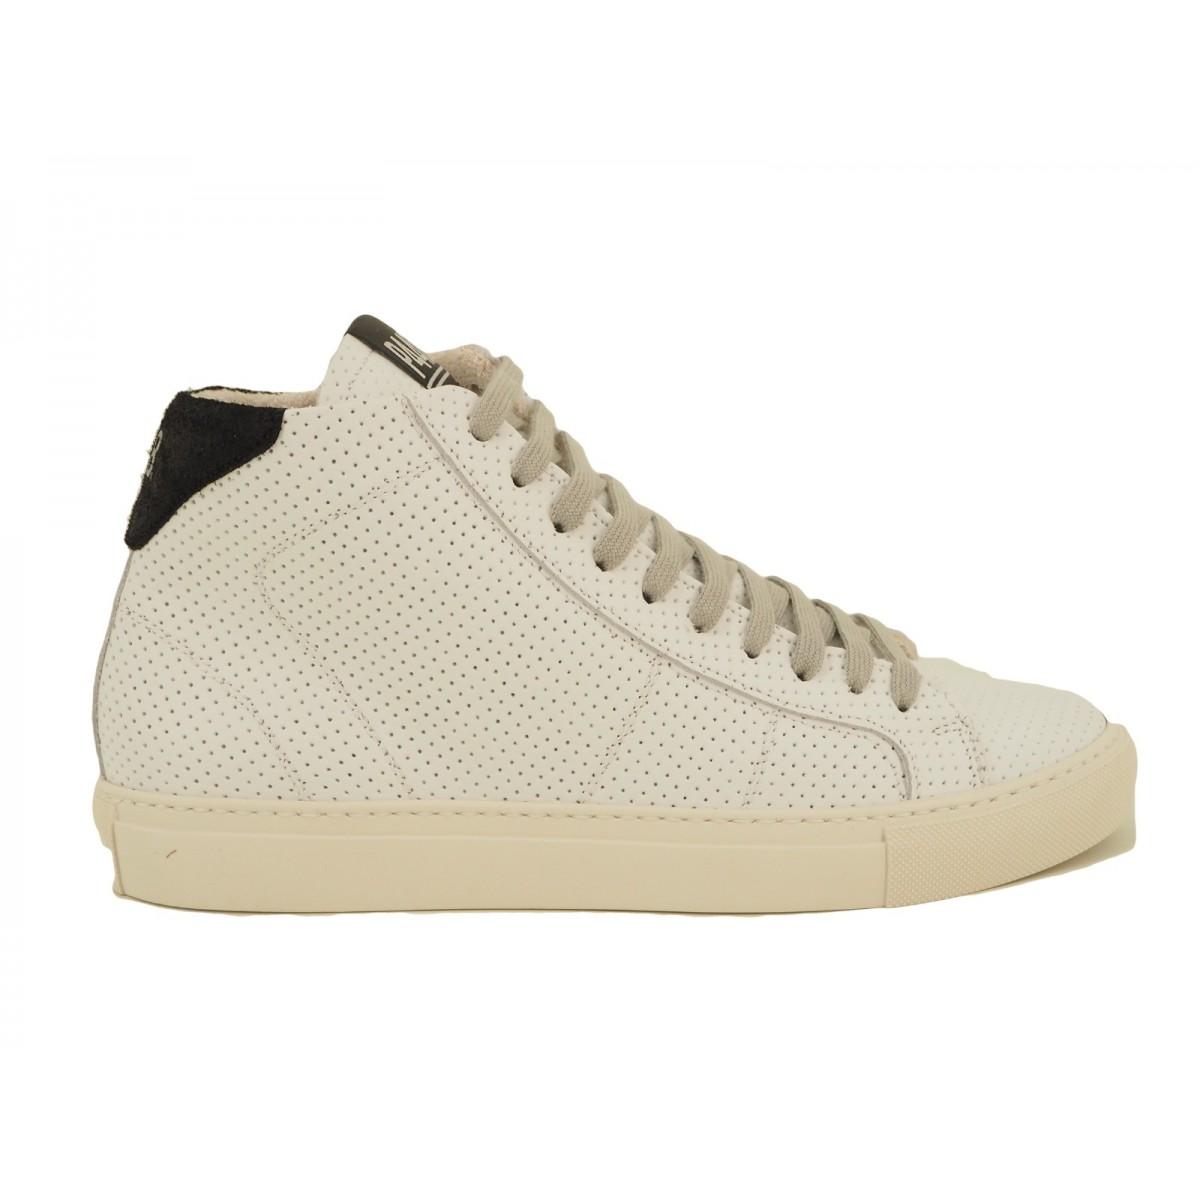 the best attitude 67de3 e5d0c P448 Scarpe Sneaker Uomo Basse - Pelle Bianca COJOHNWhiLcm